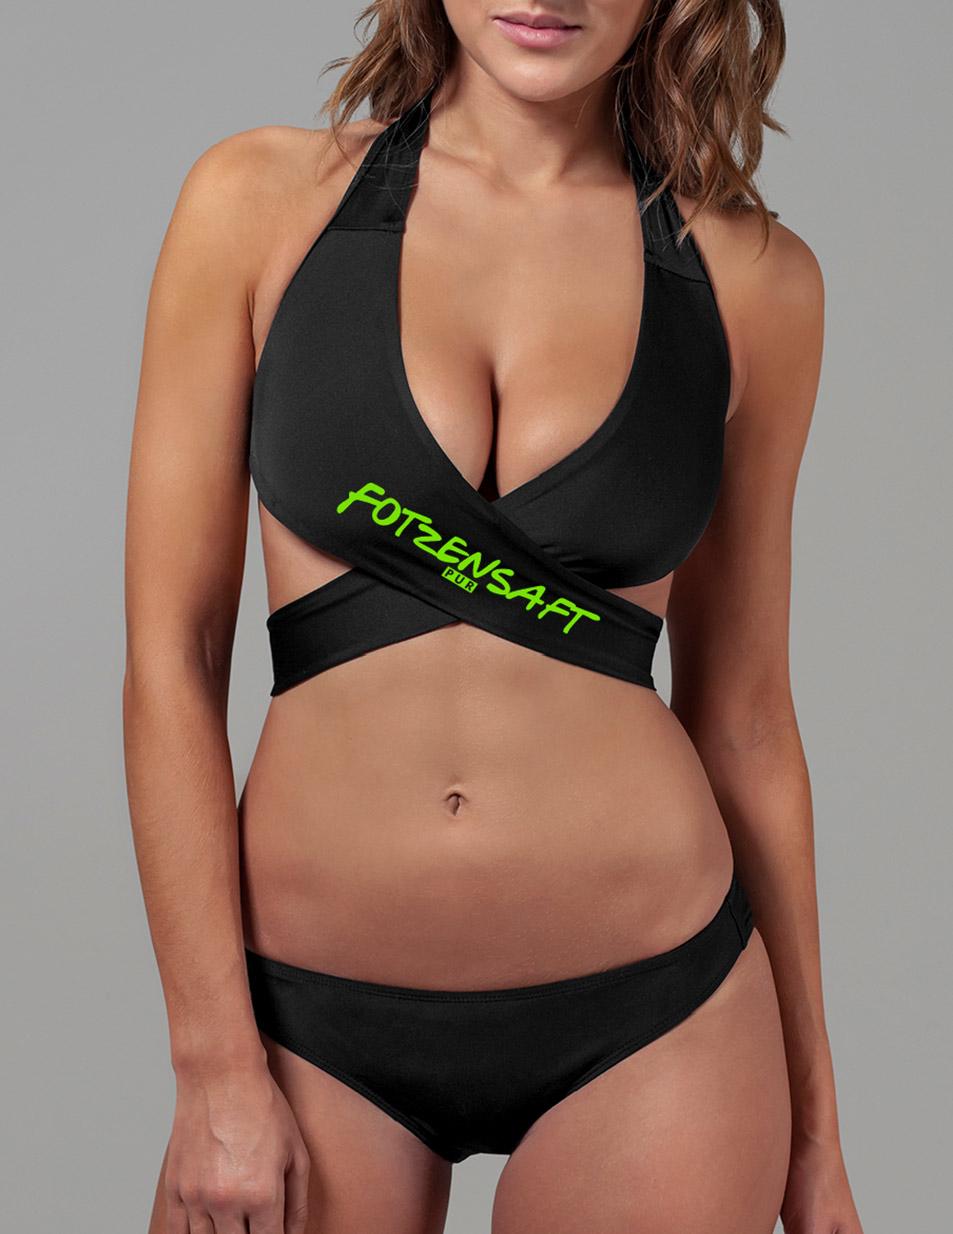 Fotzensaft Ladies Bikini neongrün auf schwarz